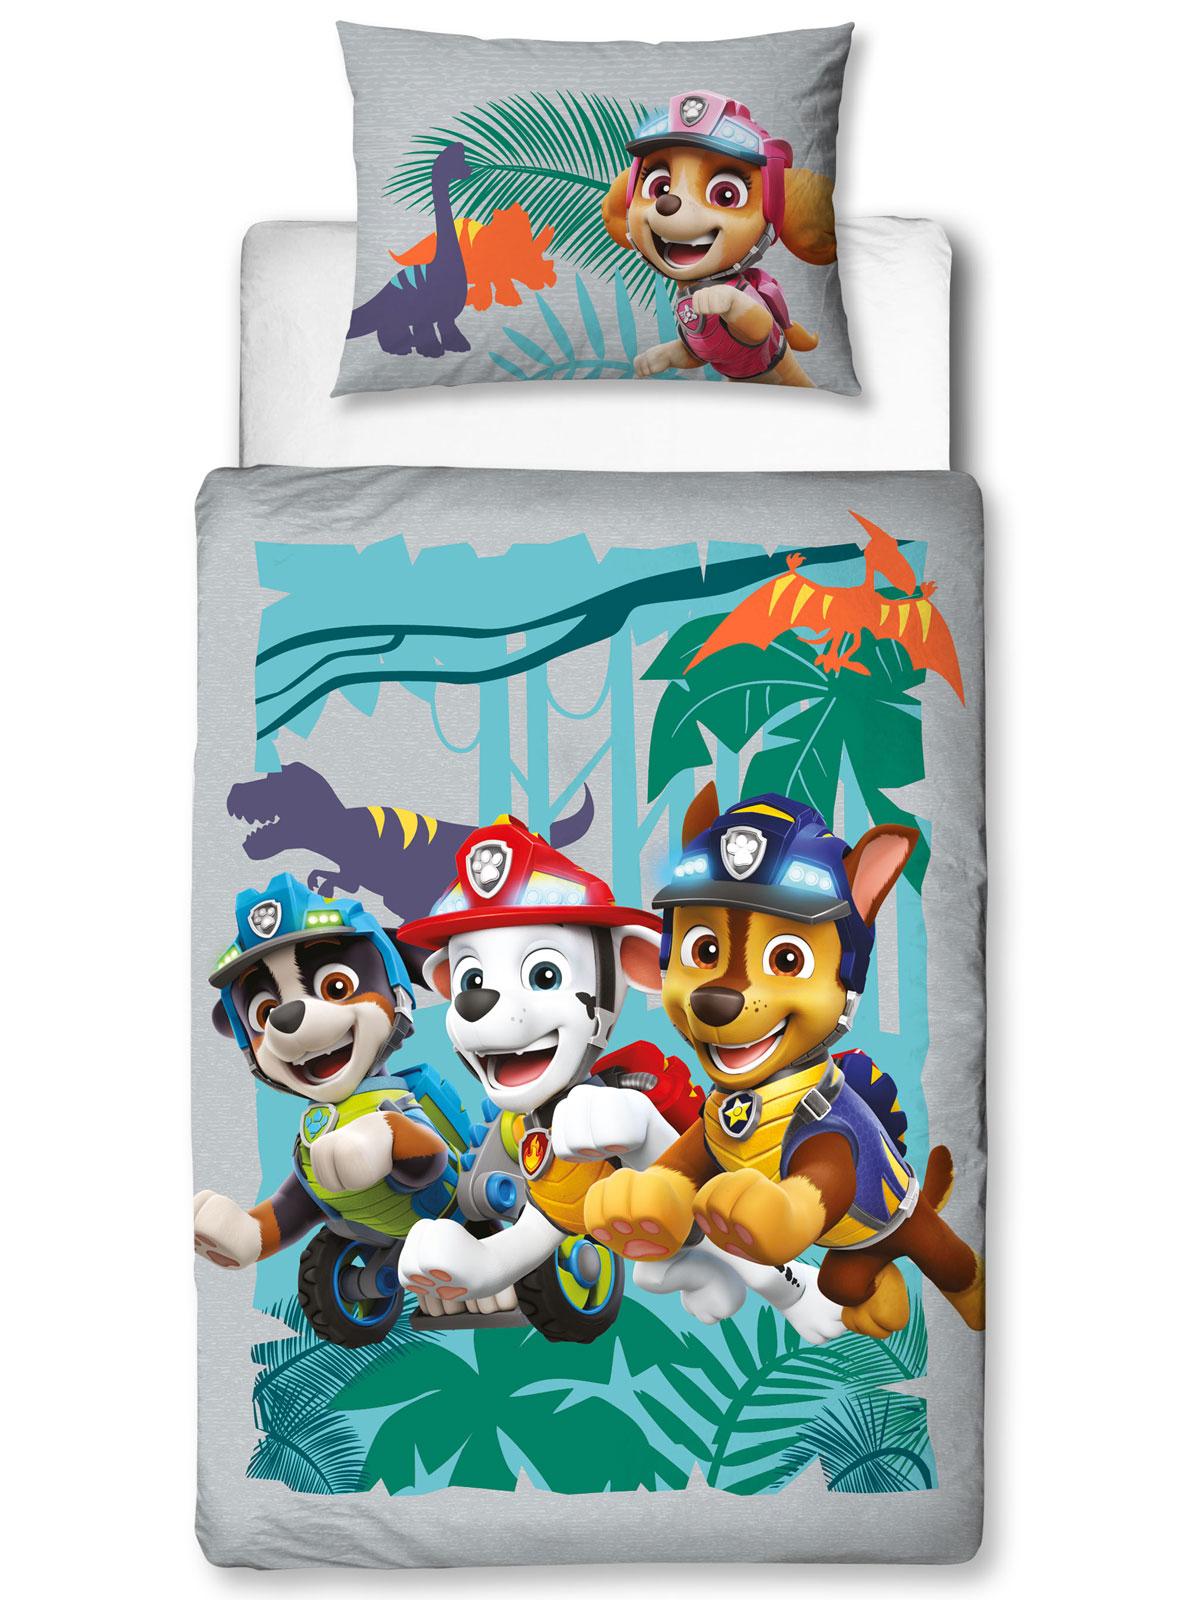 Paw Patrol Dino 4 in 1 Junior Bedding Bundle Set (Duvet, Pillow and